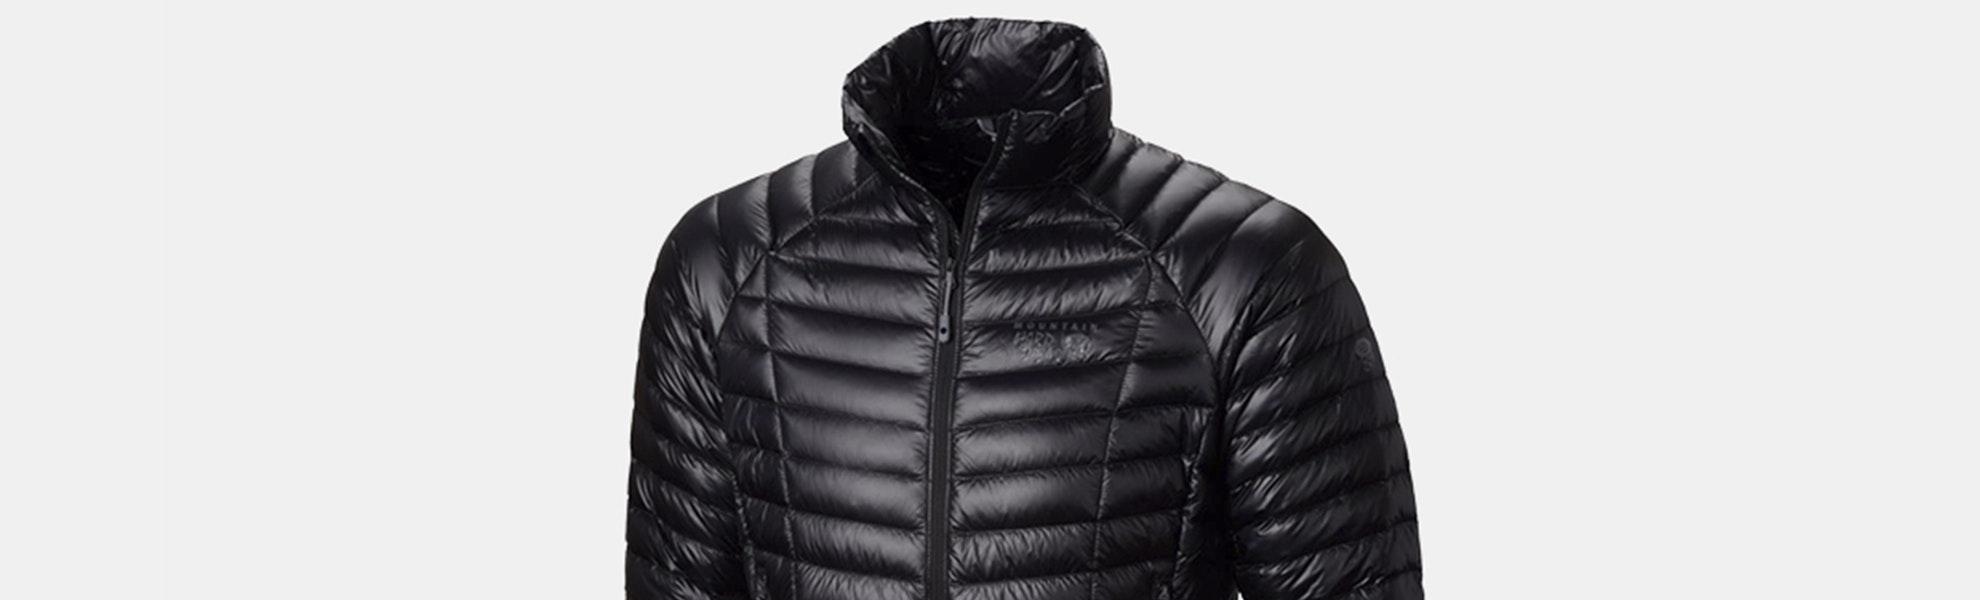 Mountain Hardwear Ghost Whisperer Jackets & Vests